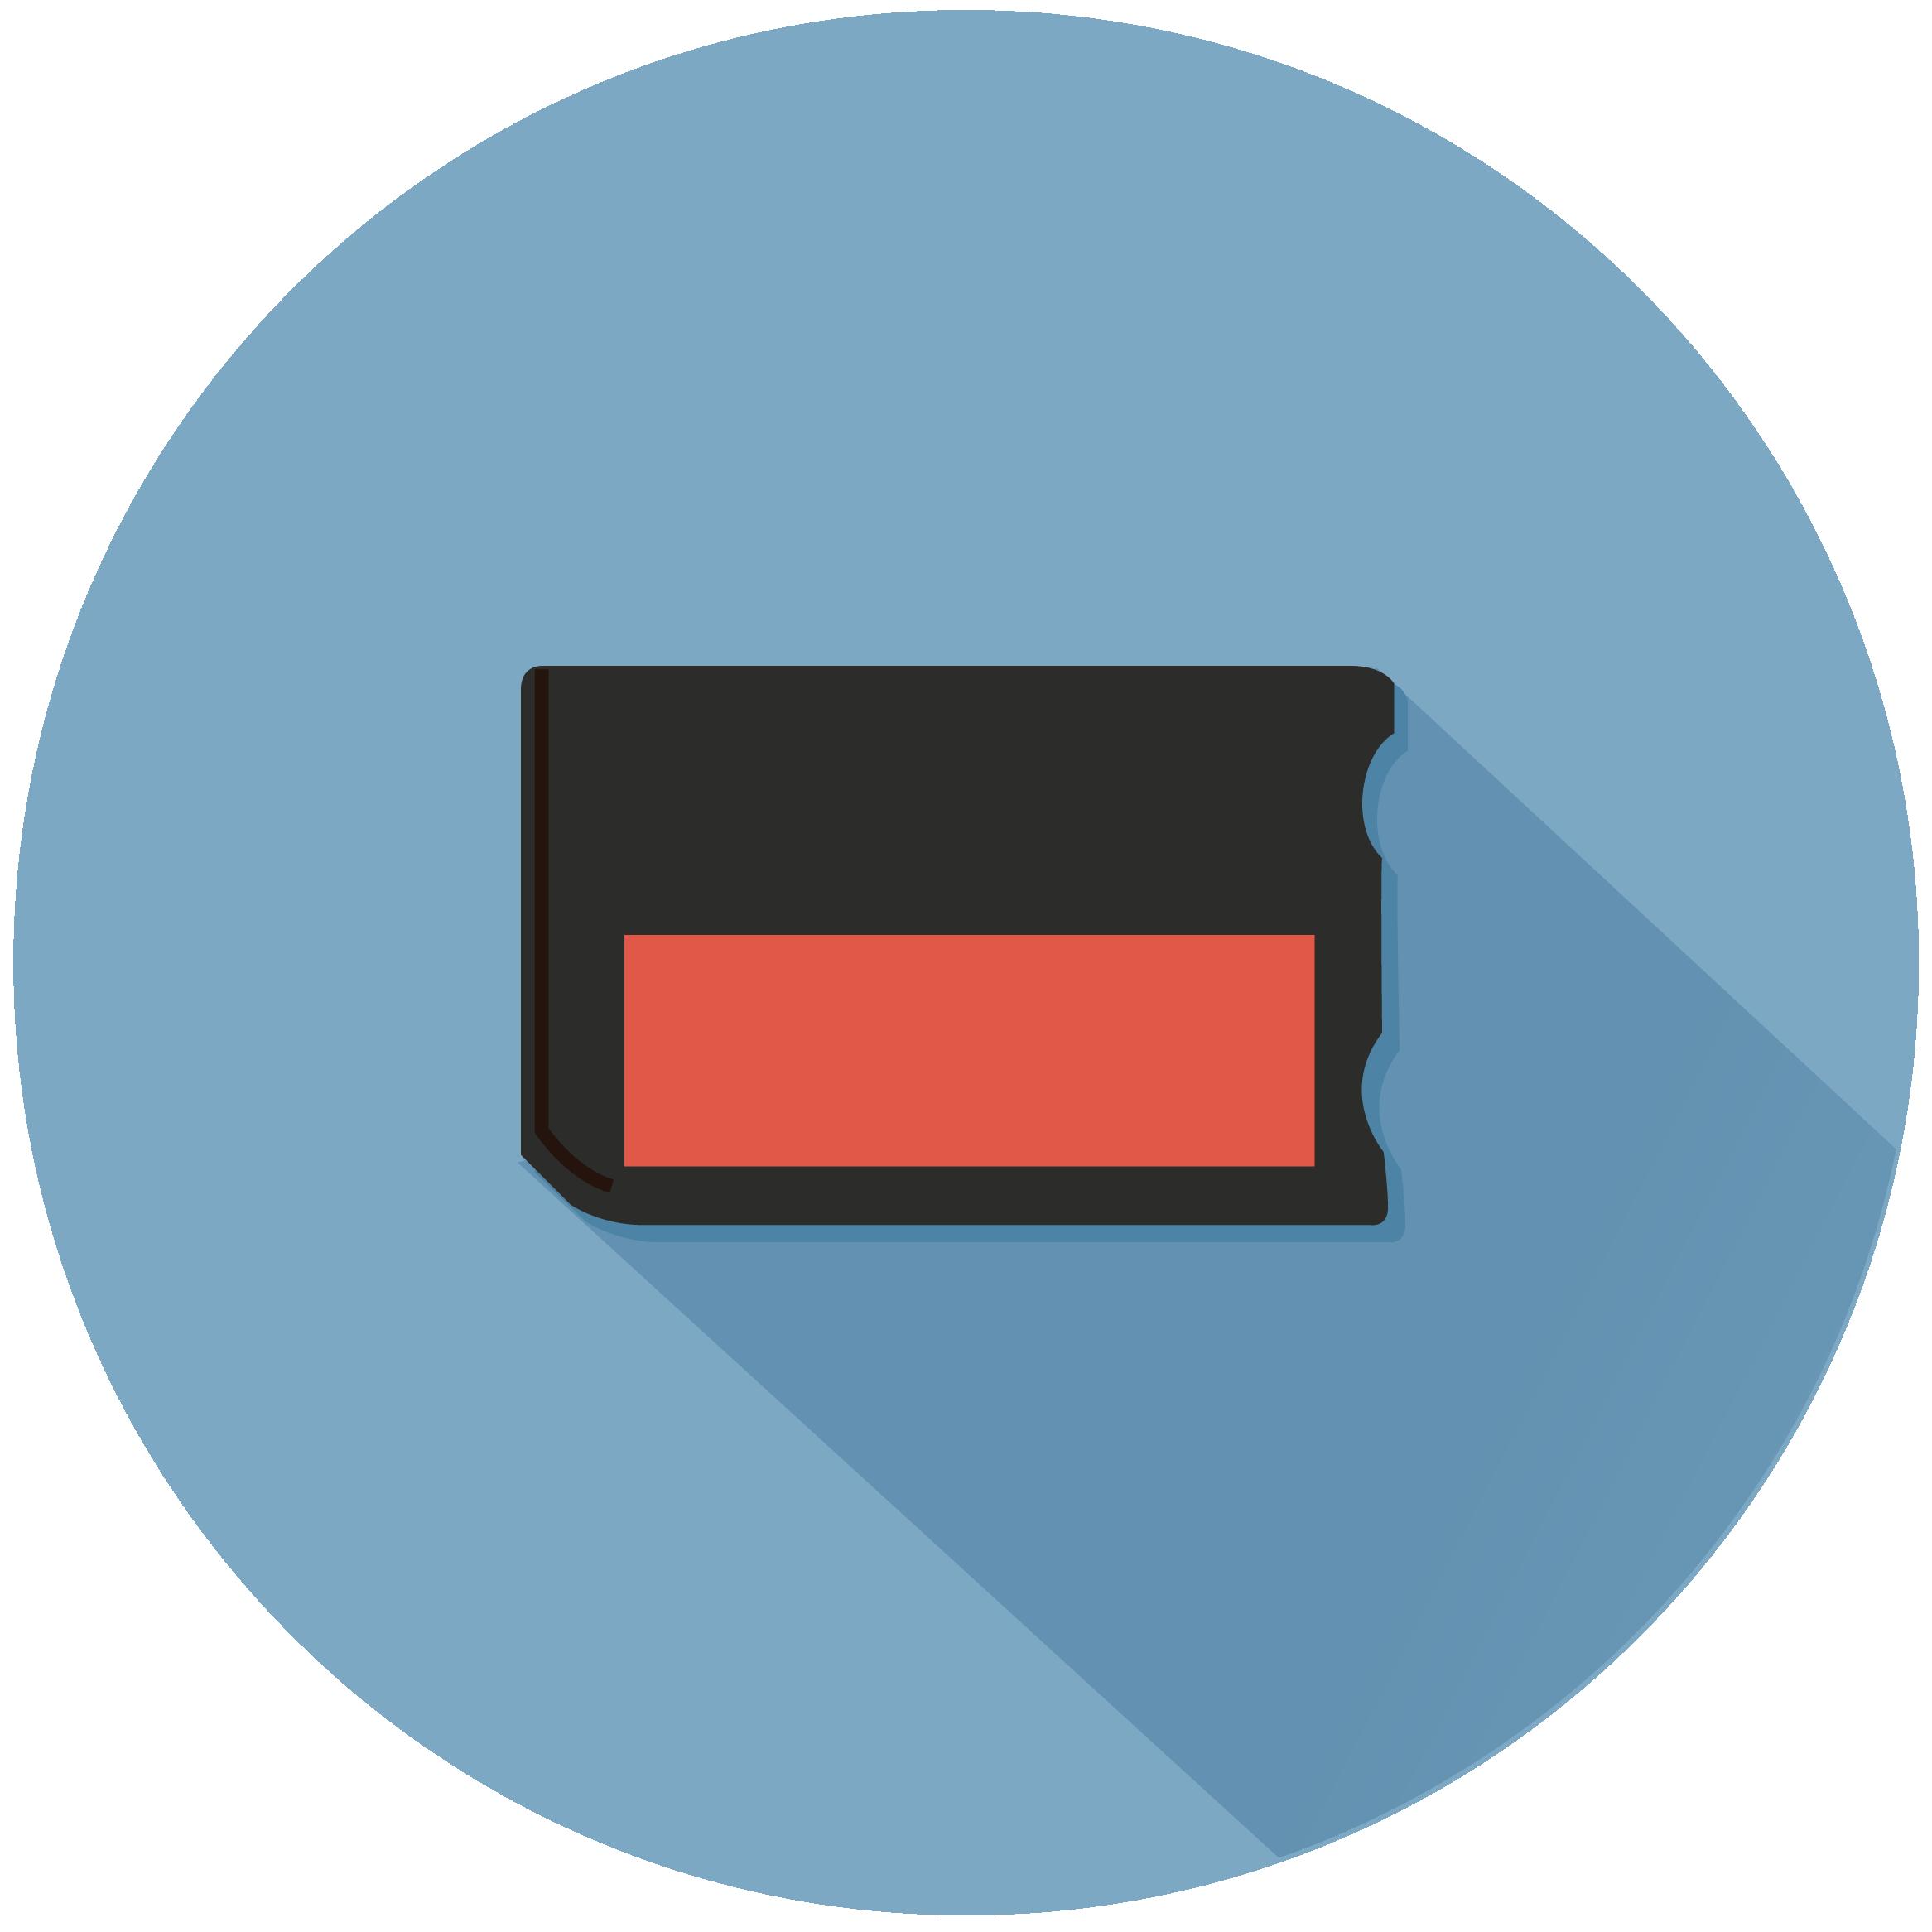 Memory Stick (MS)